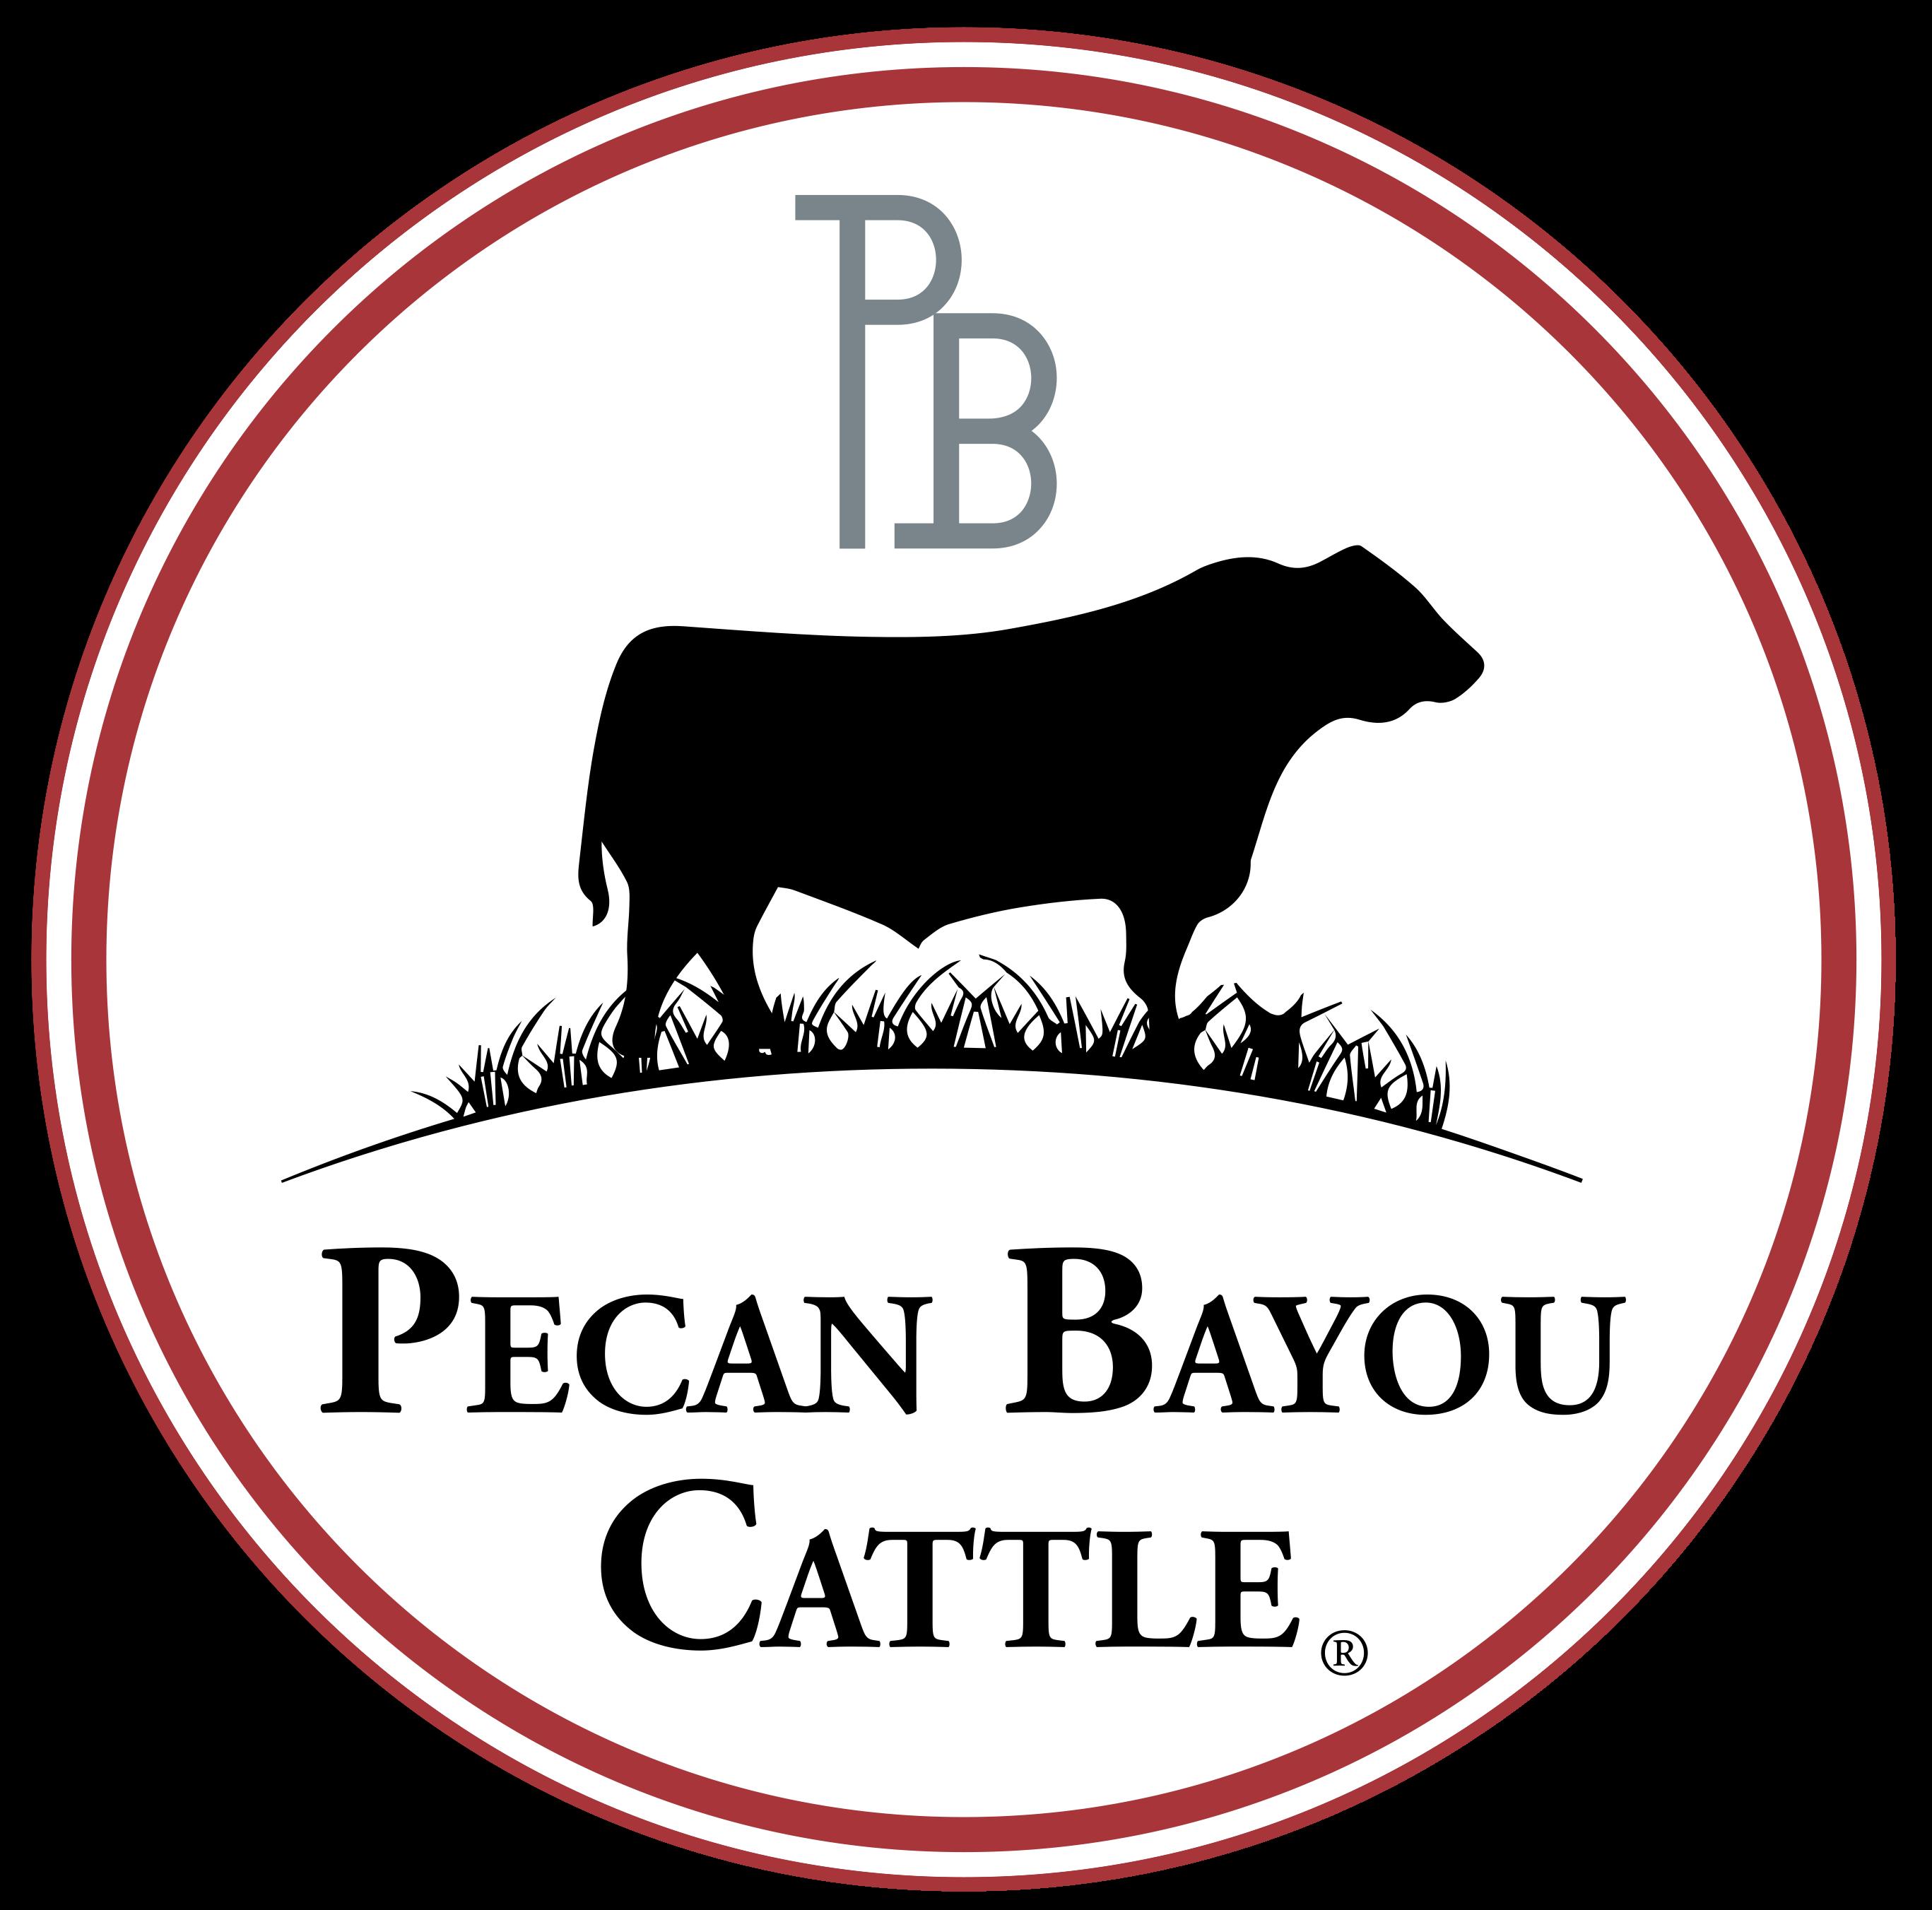 Pecan Bayou Cattle®